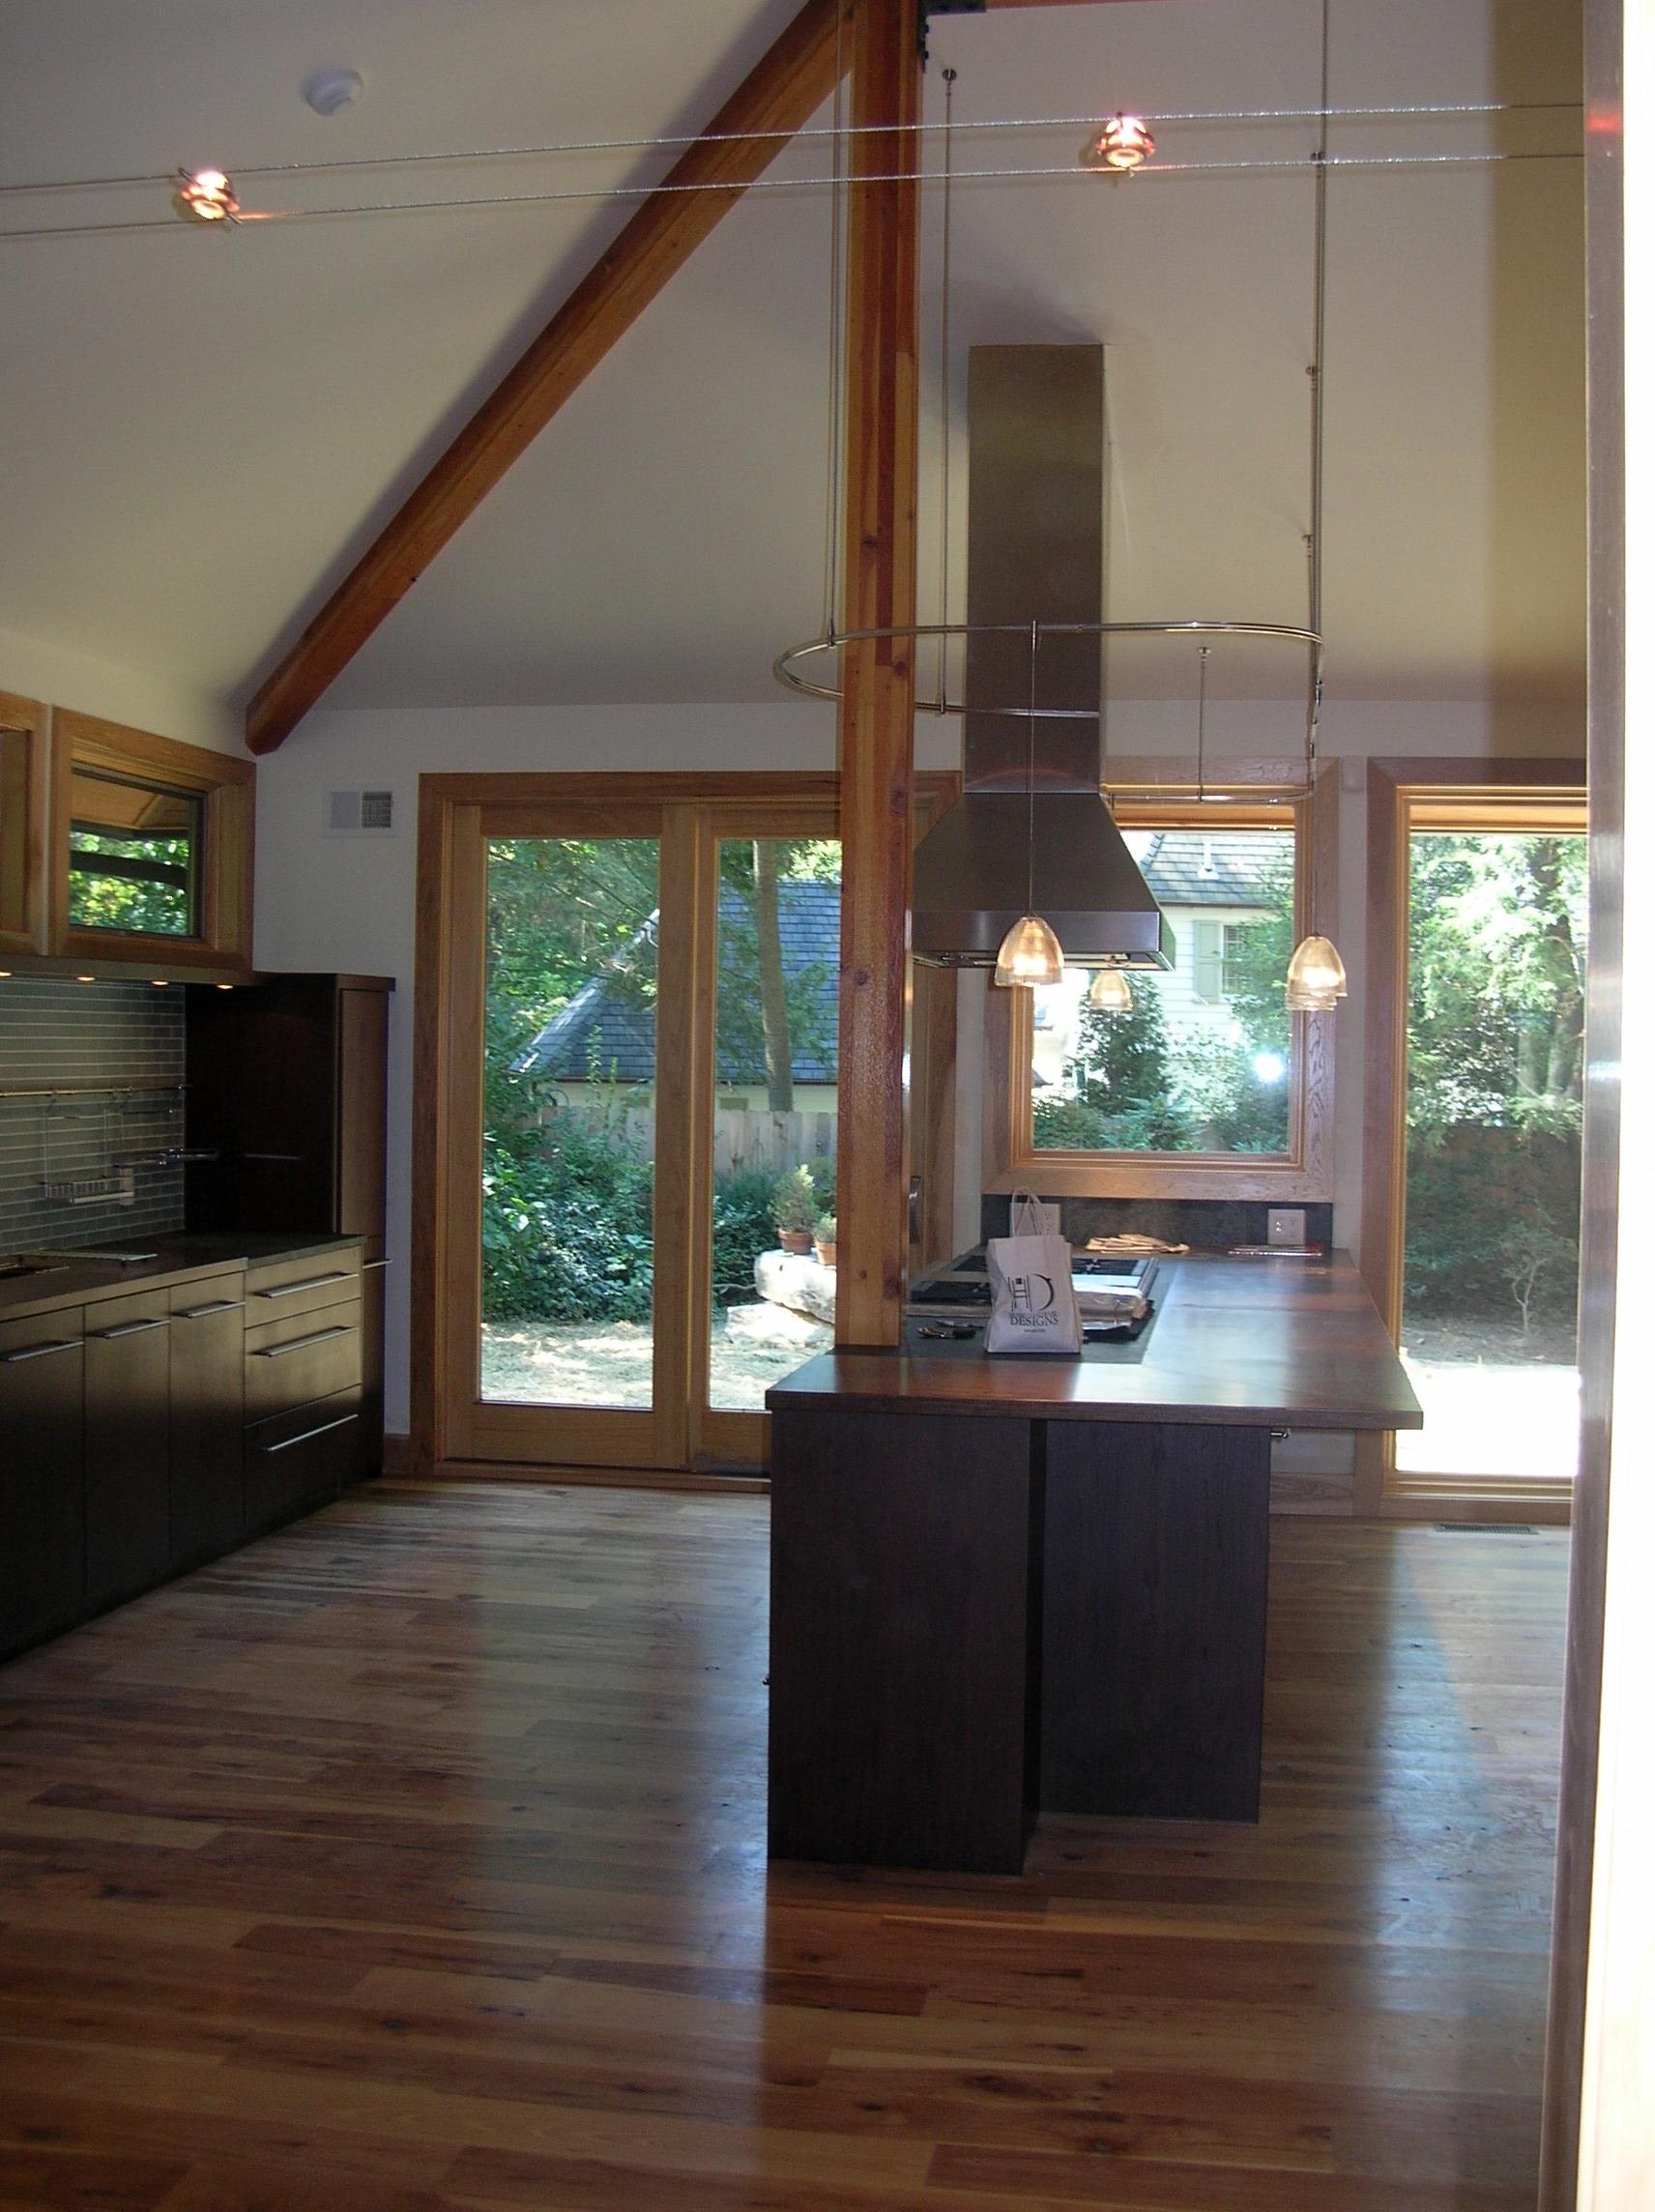 Price Kitchen Island Wood Flooring Island Rangehood Glass Backsplash Dark Wood Cabinets.jpg